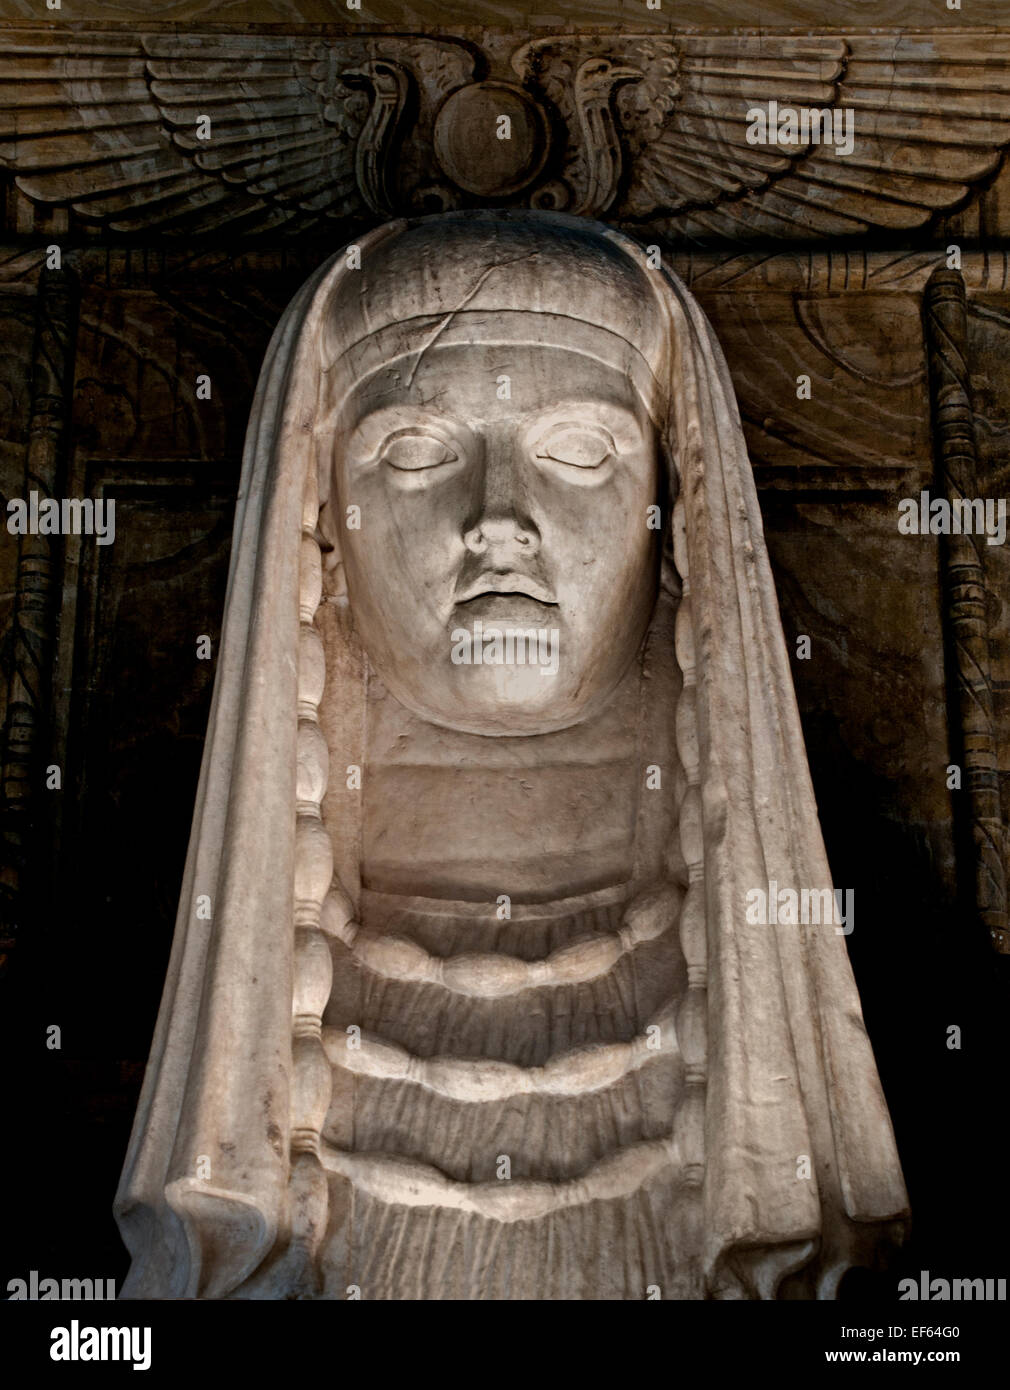 Egyptian Goddess Isis Stock Photos & Egyptian Goddess Isis Stock Images - Alamy